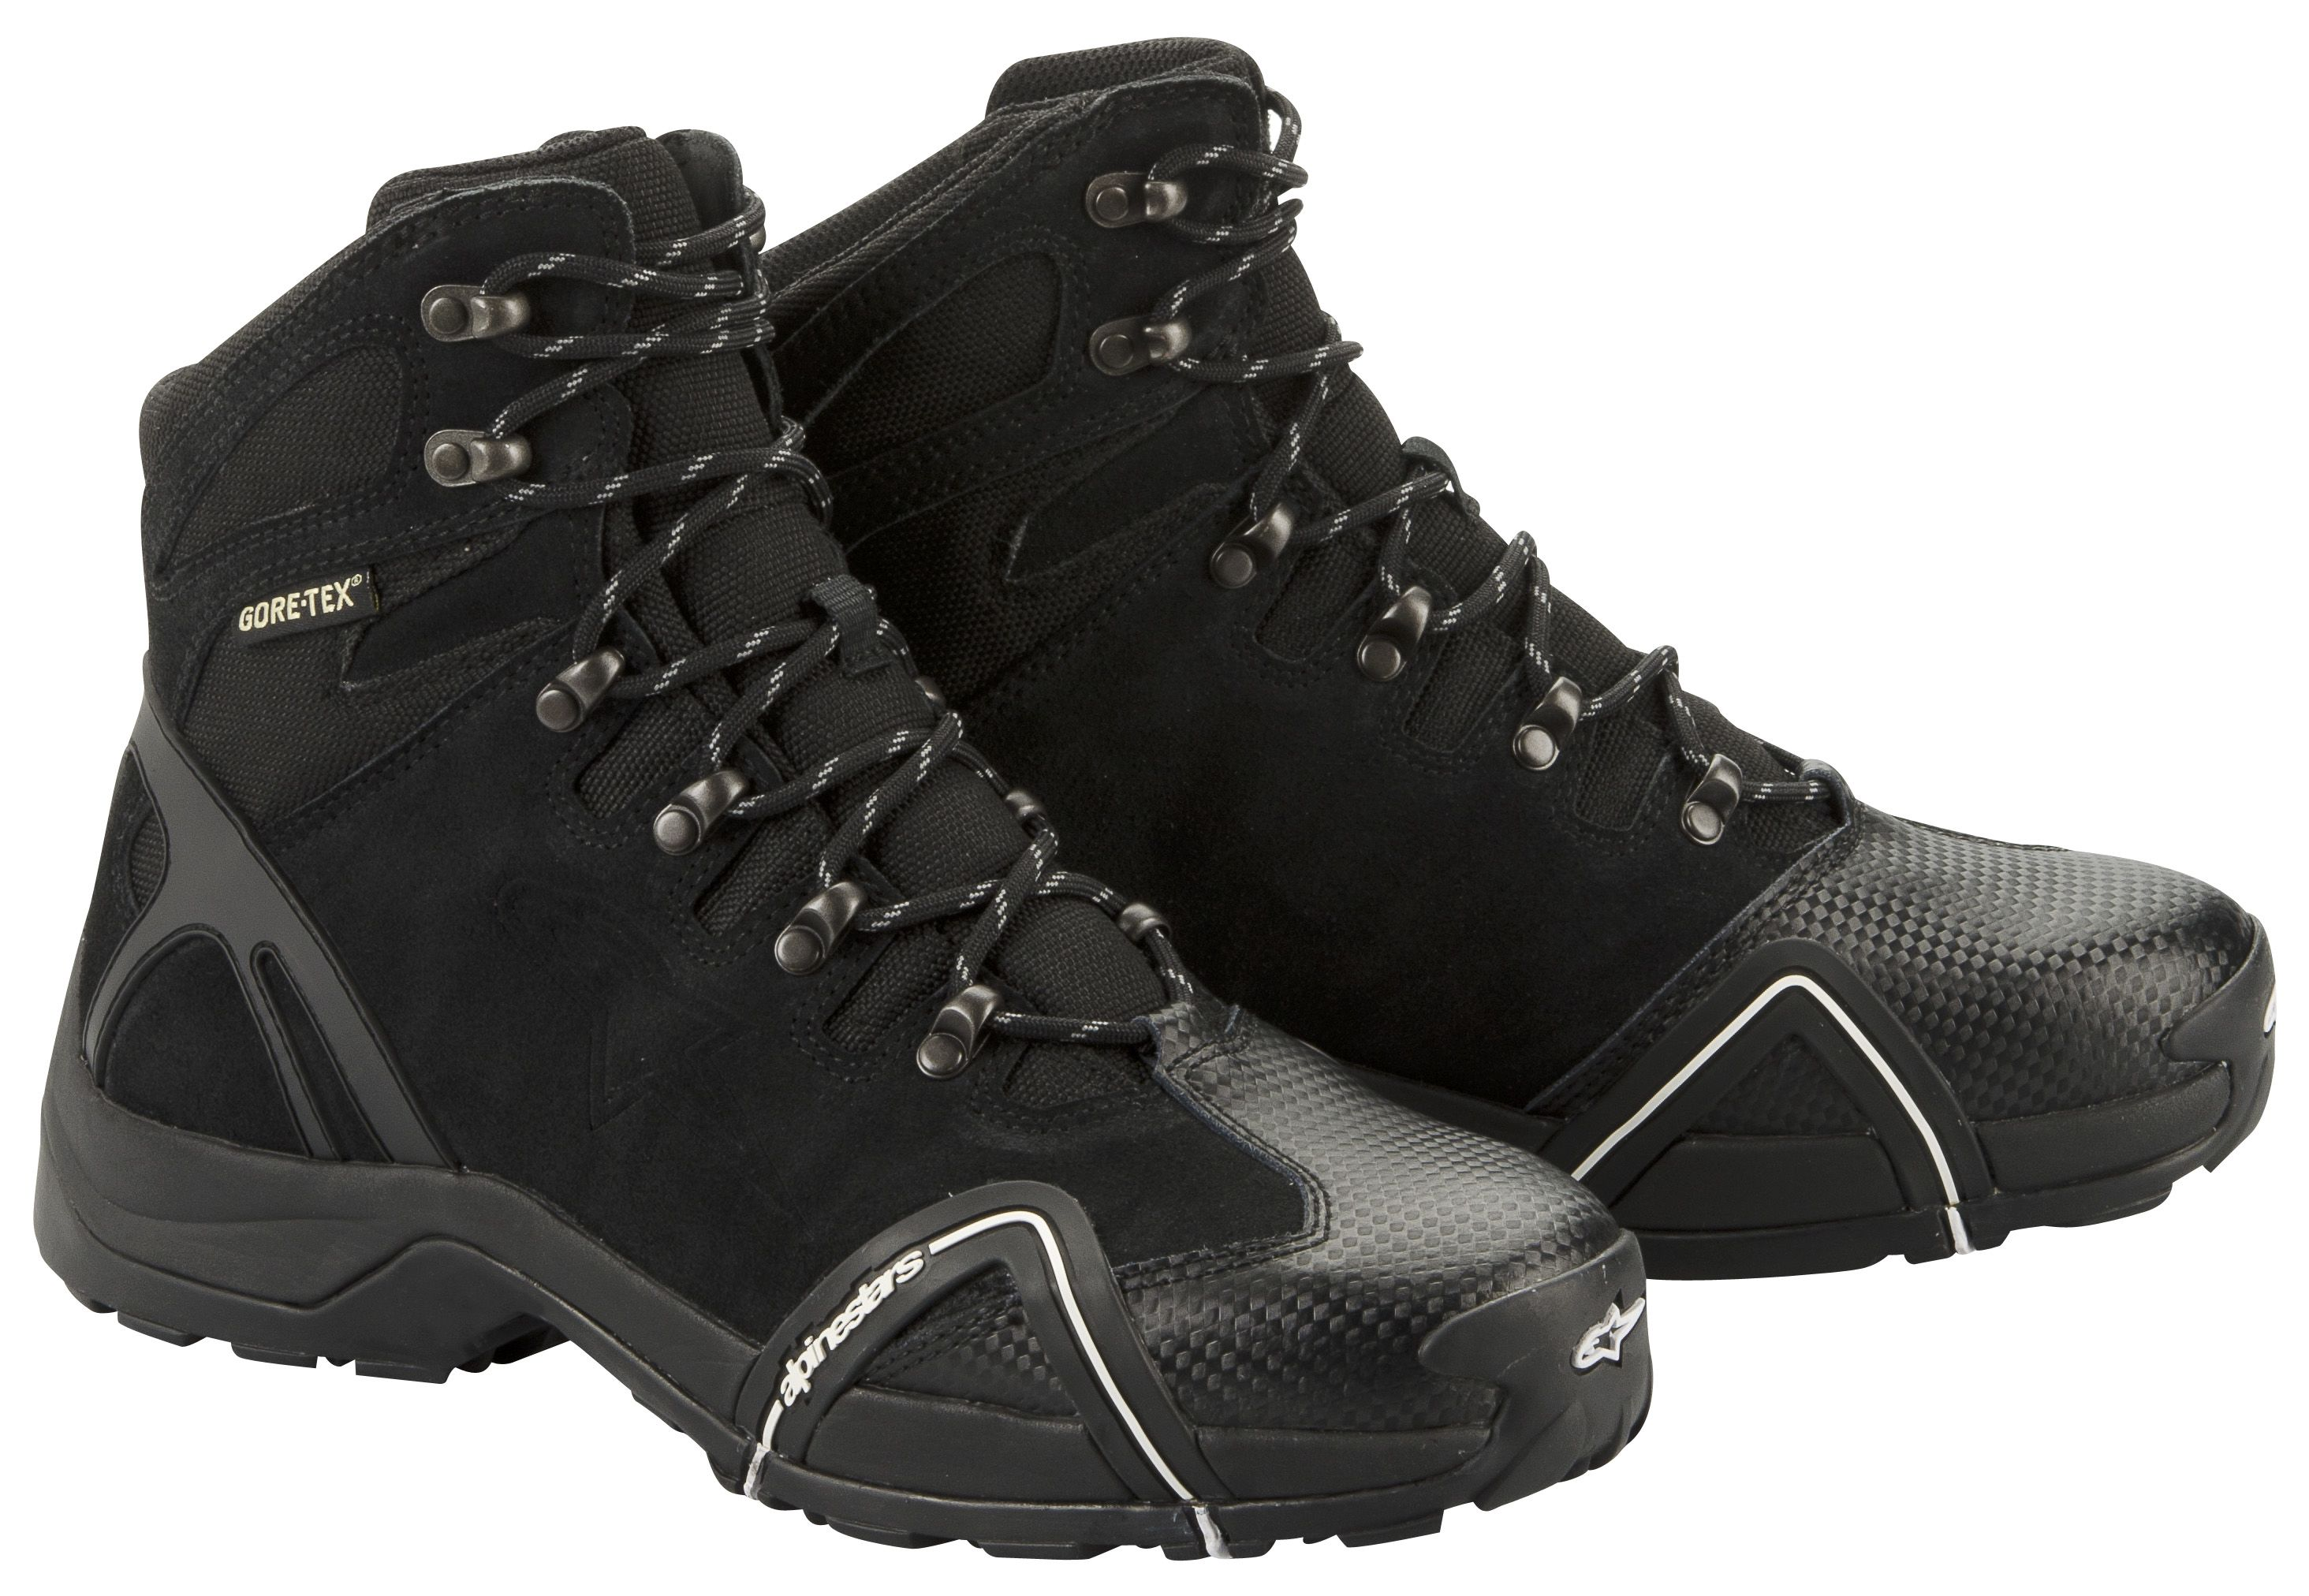 Alpinestars Cr 4 Gore Tex Xcr Boots Size 6 Only Revzilla